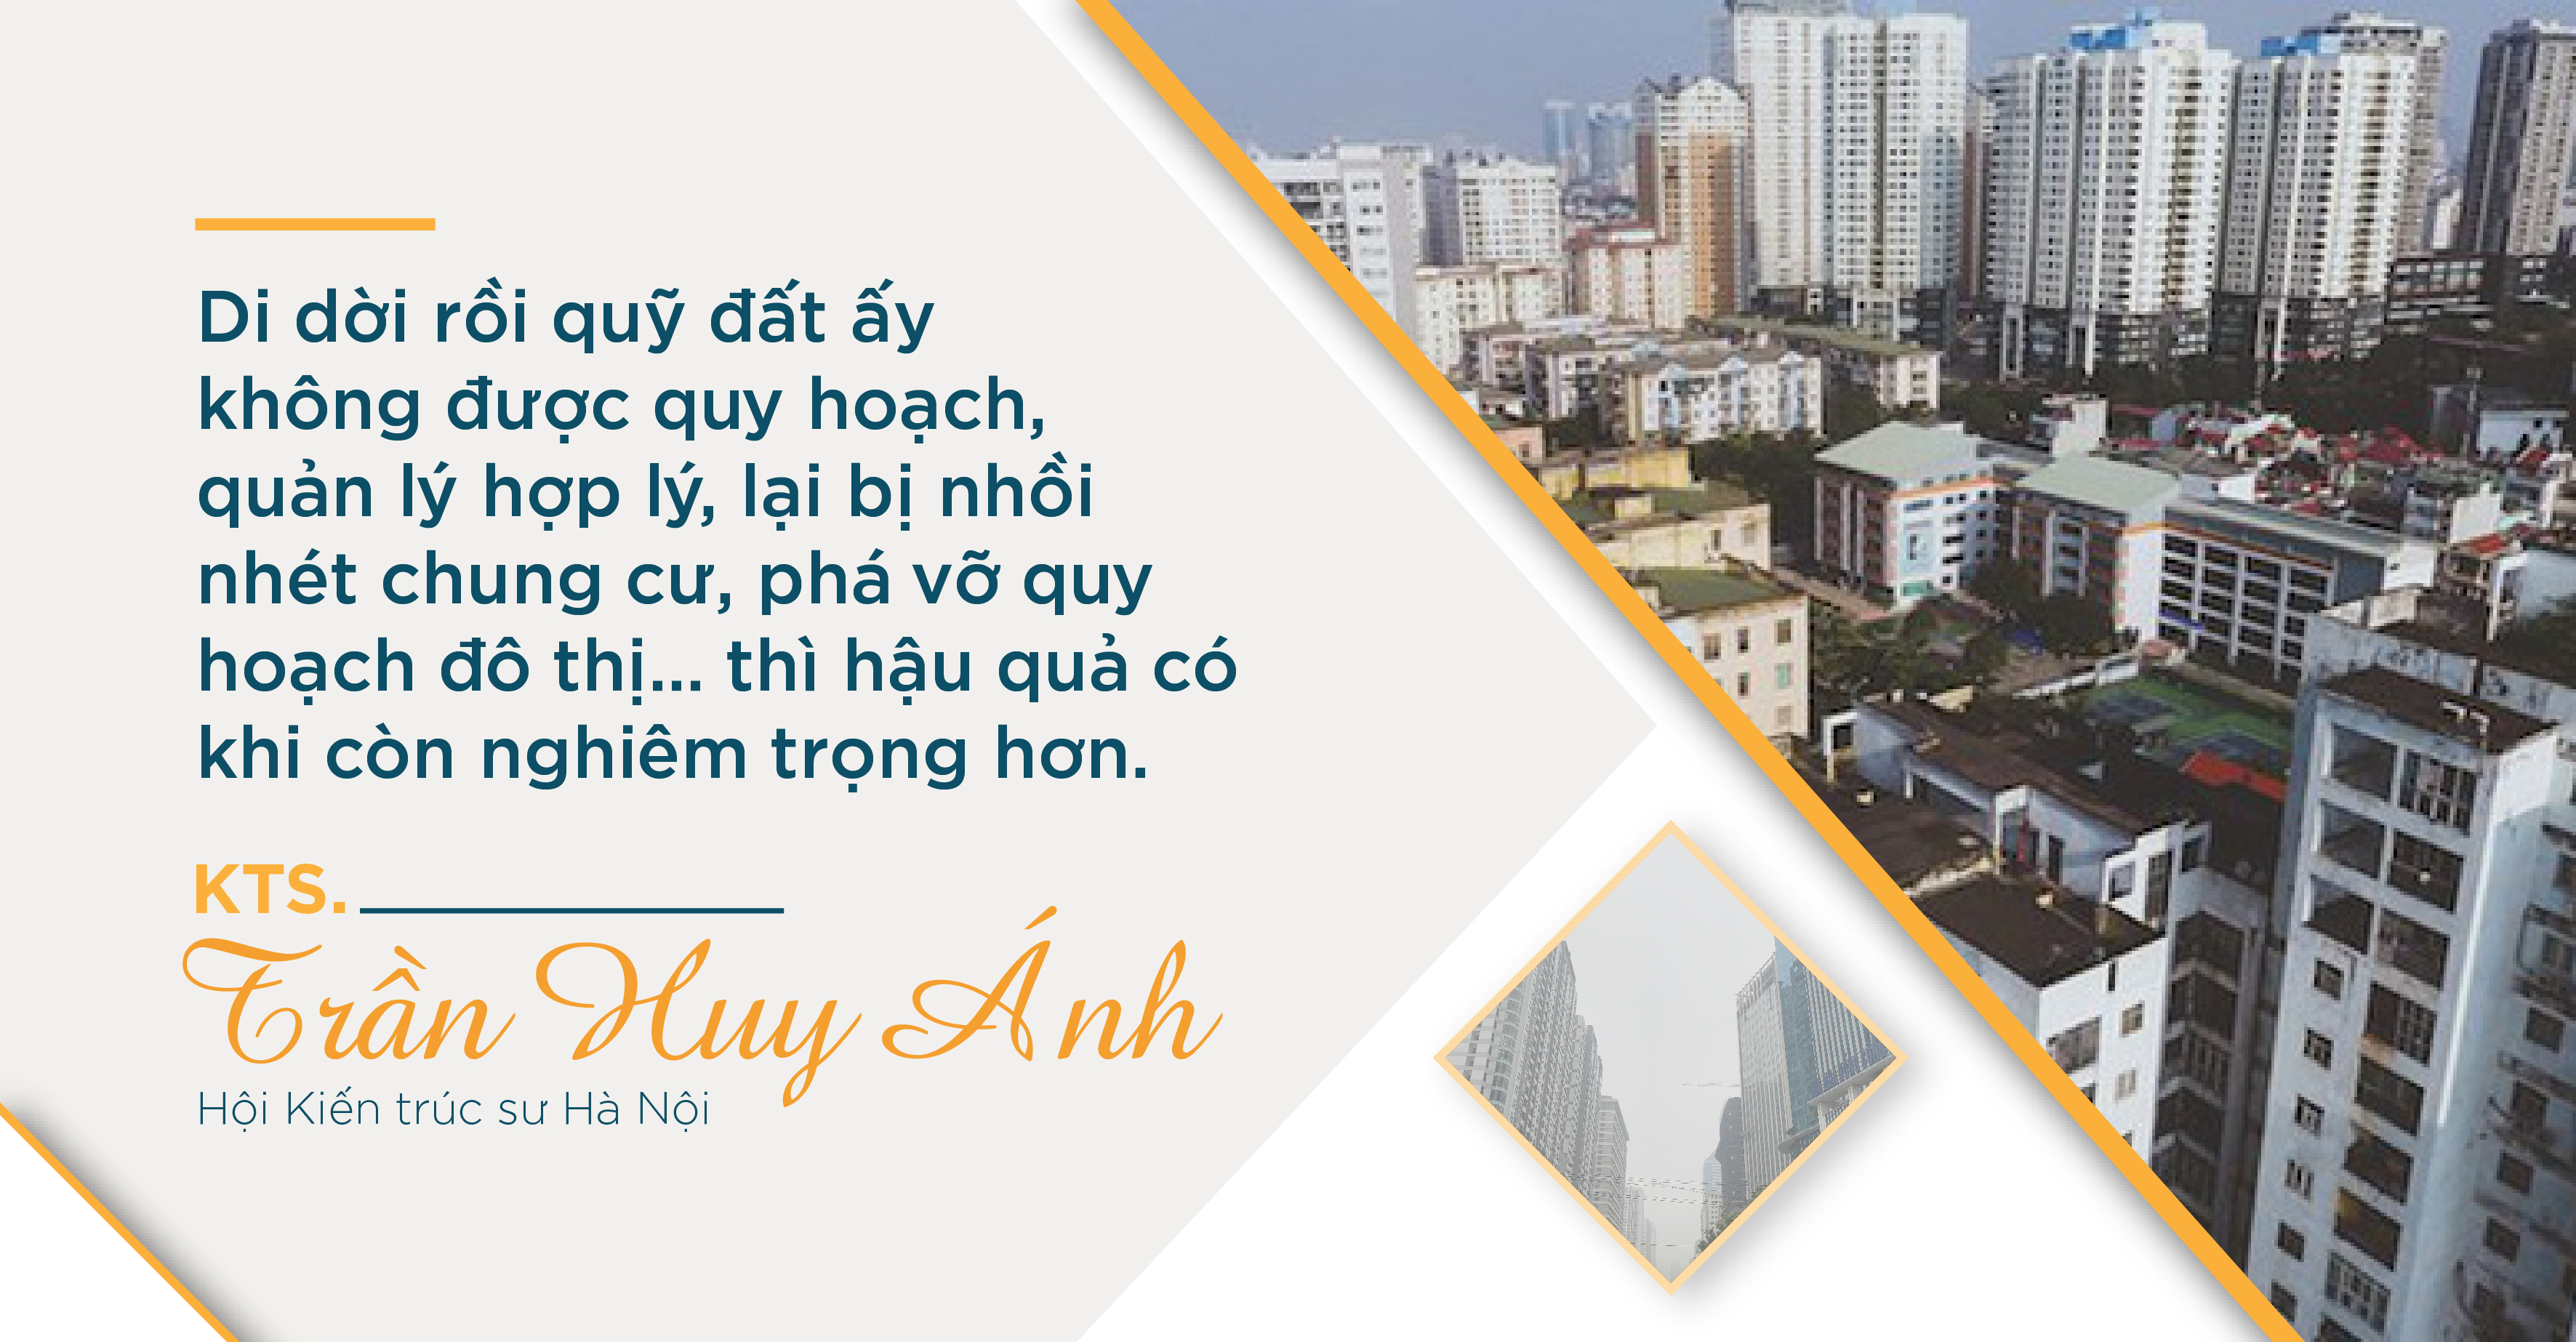 di doi nha may 4